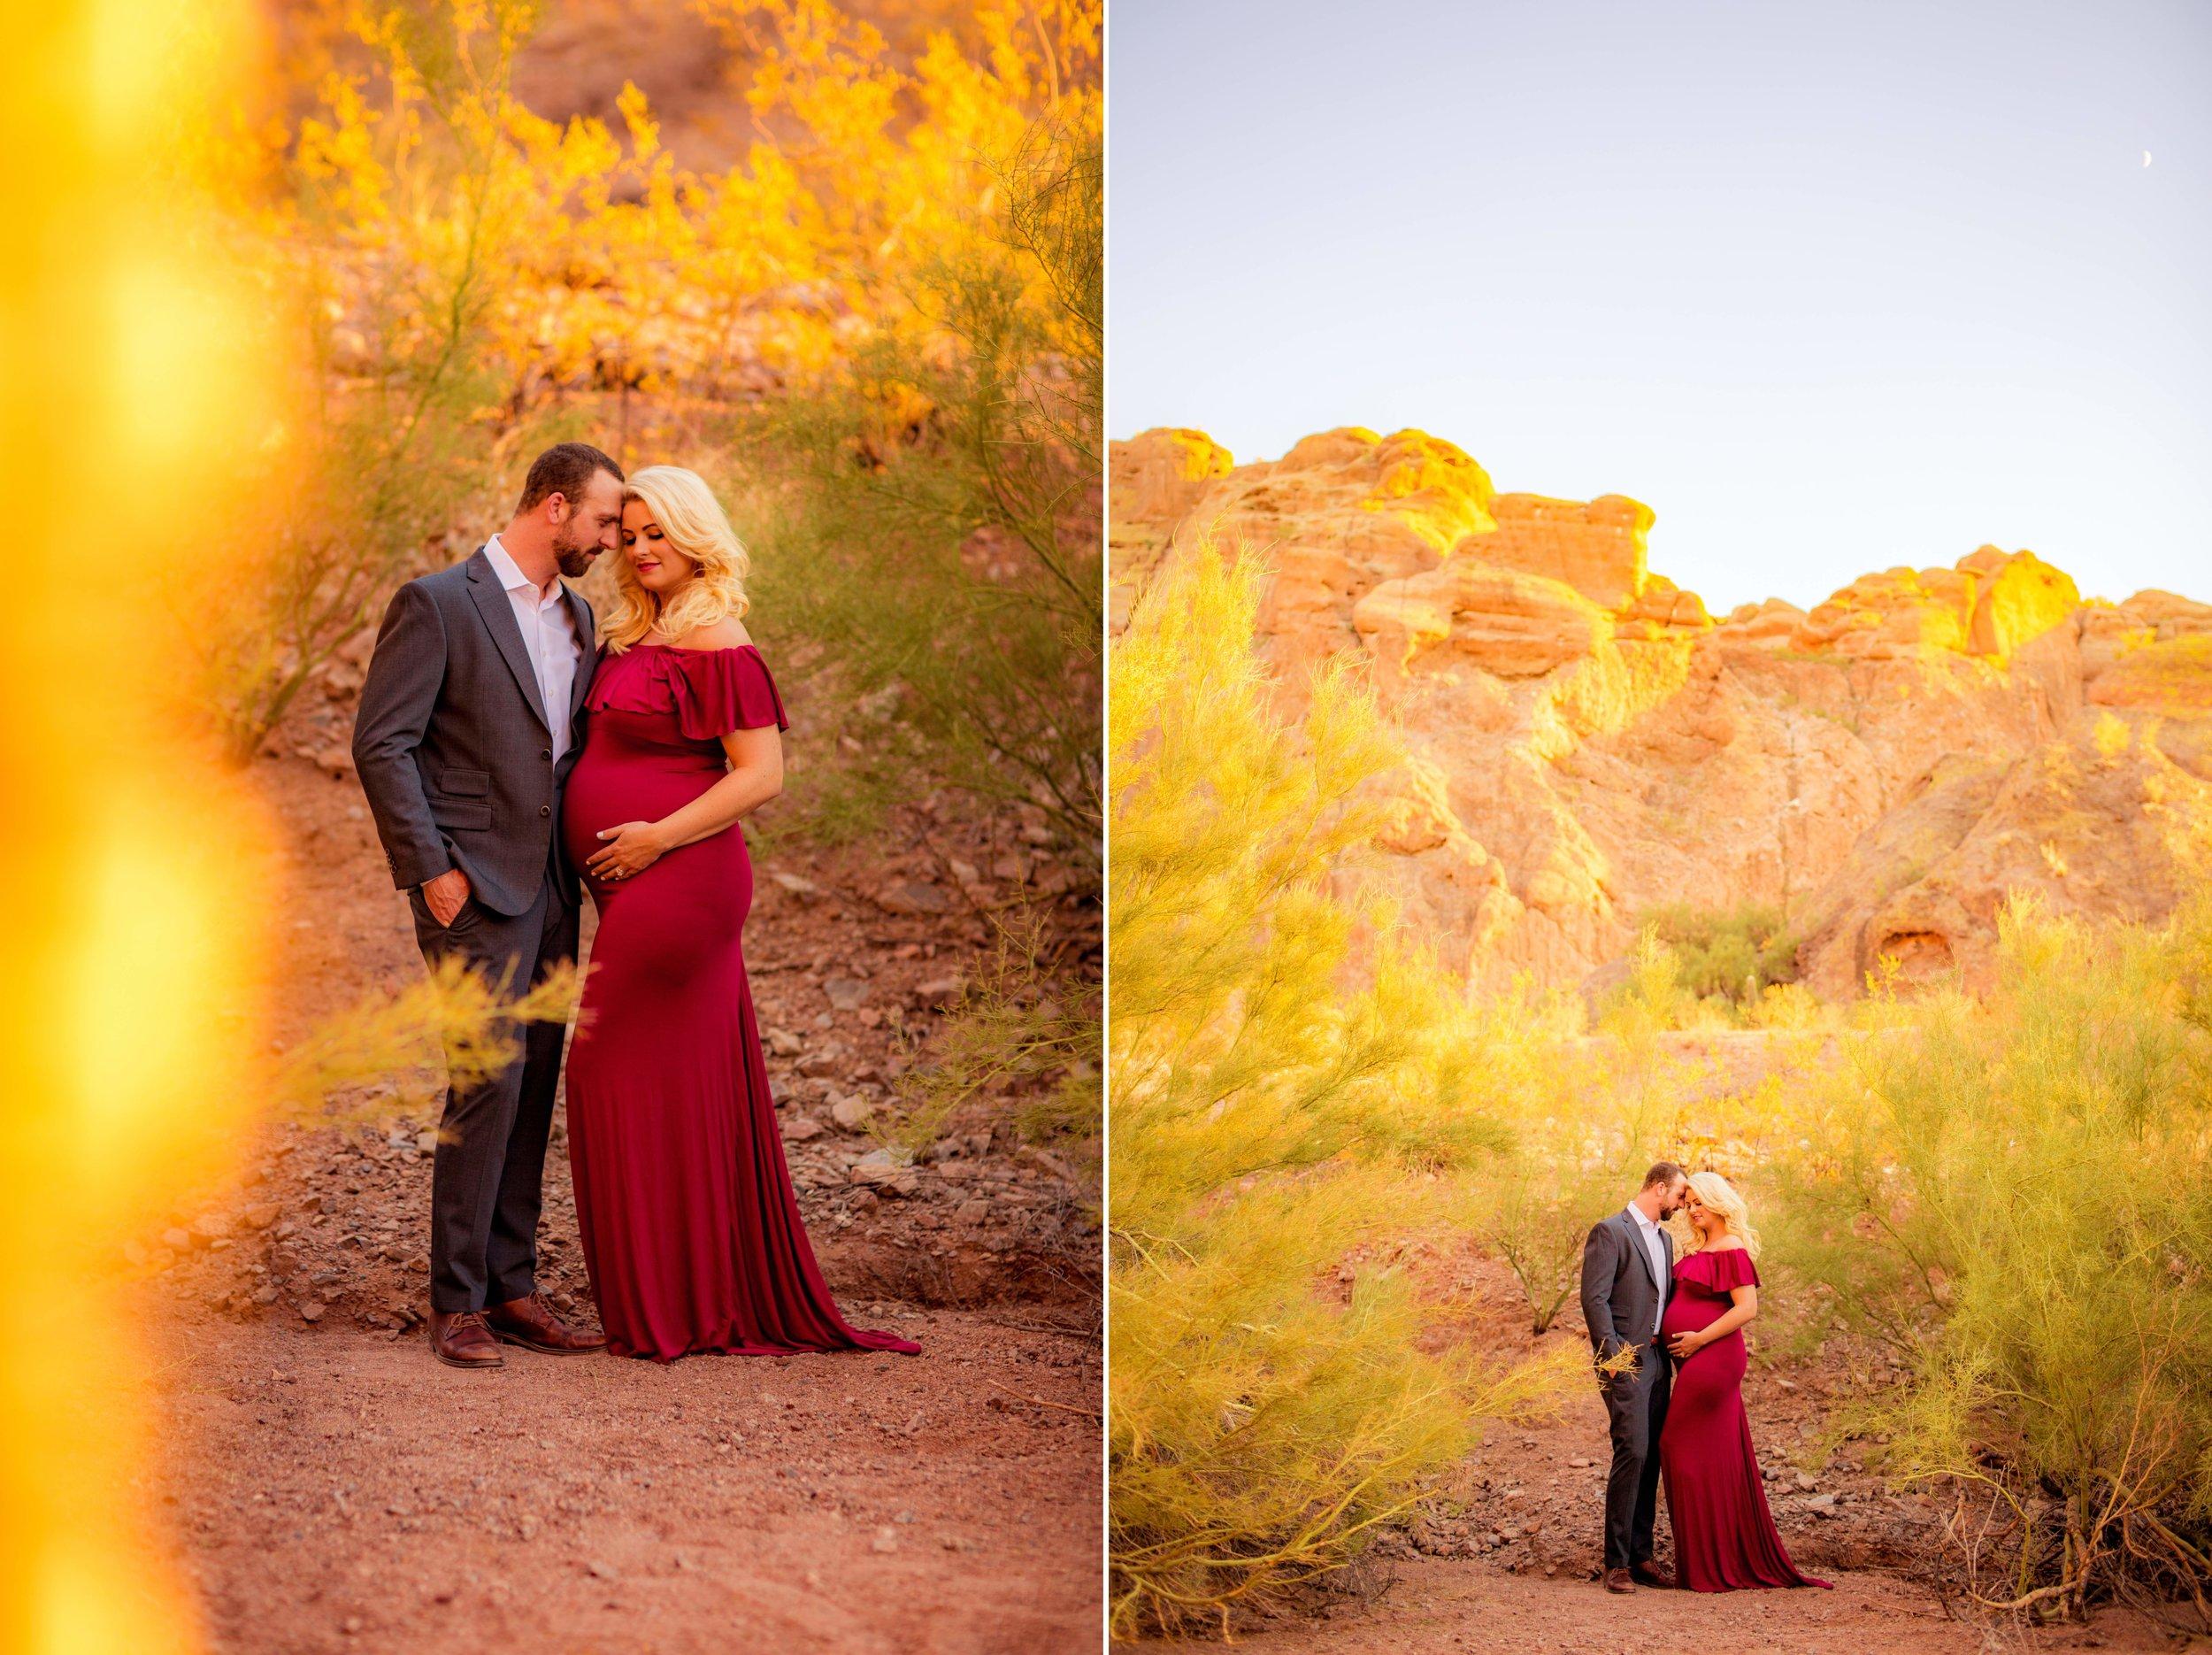 -colorado-wedding-photographer-denver-springs-vail-607A0175 copy.jpeg